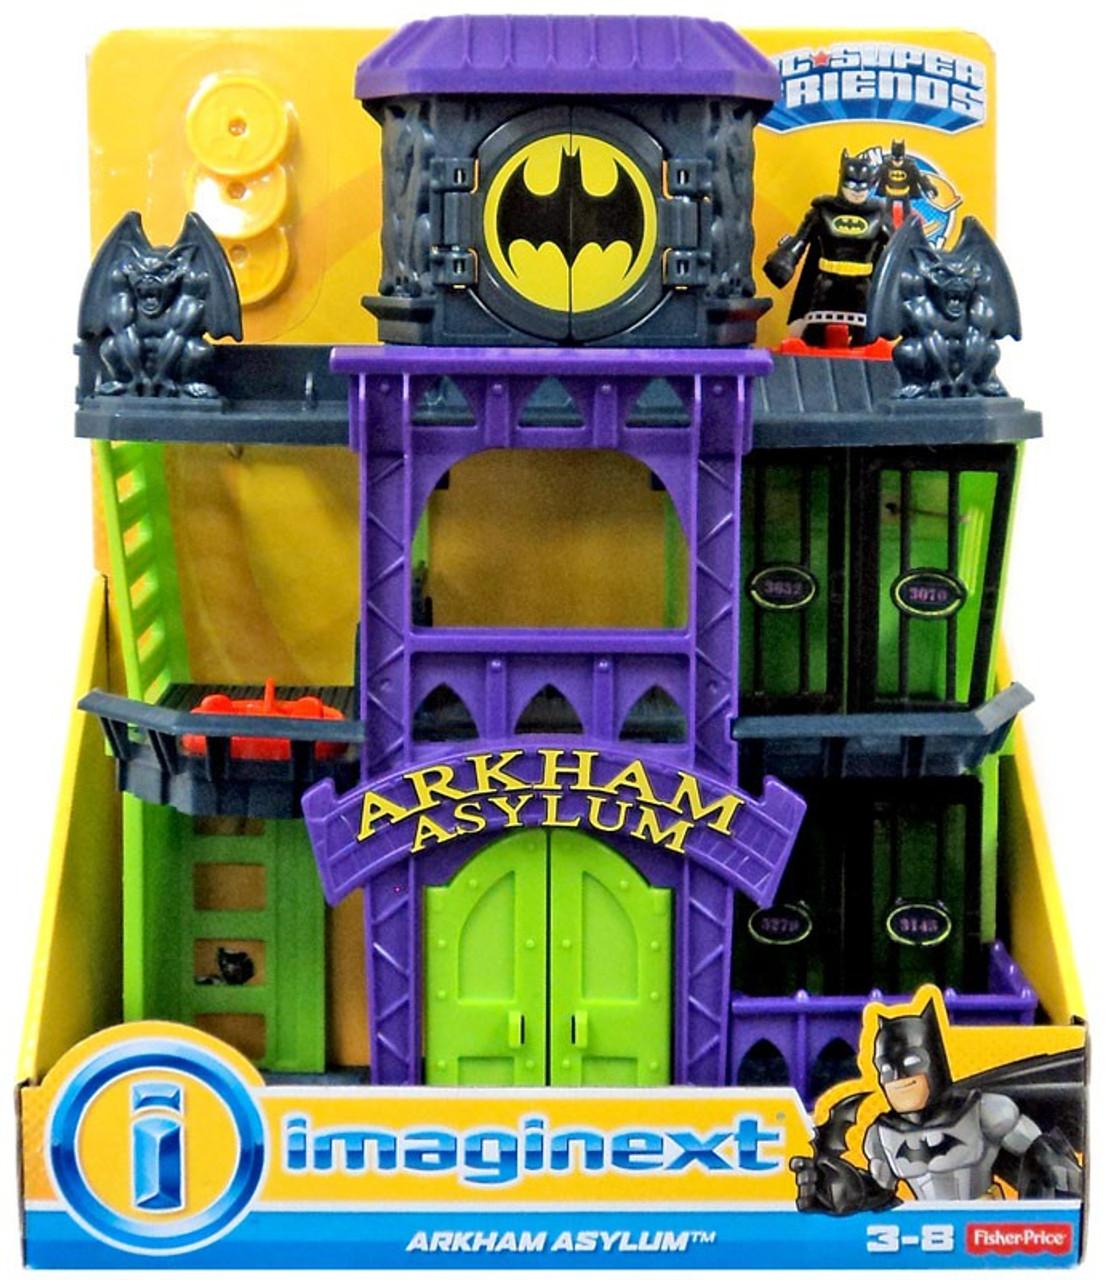 Fisher Price Dc Super Friends Batman Imaginext Arkham